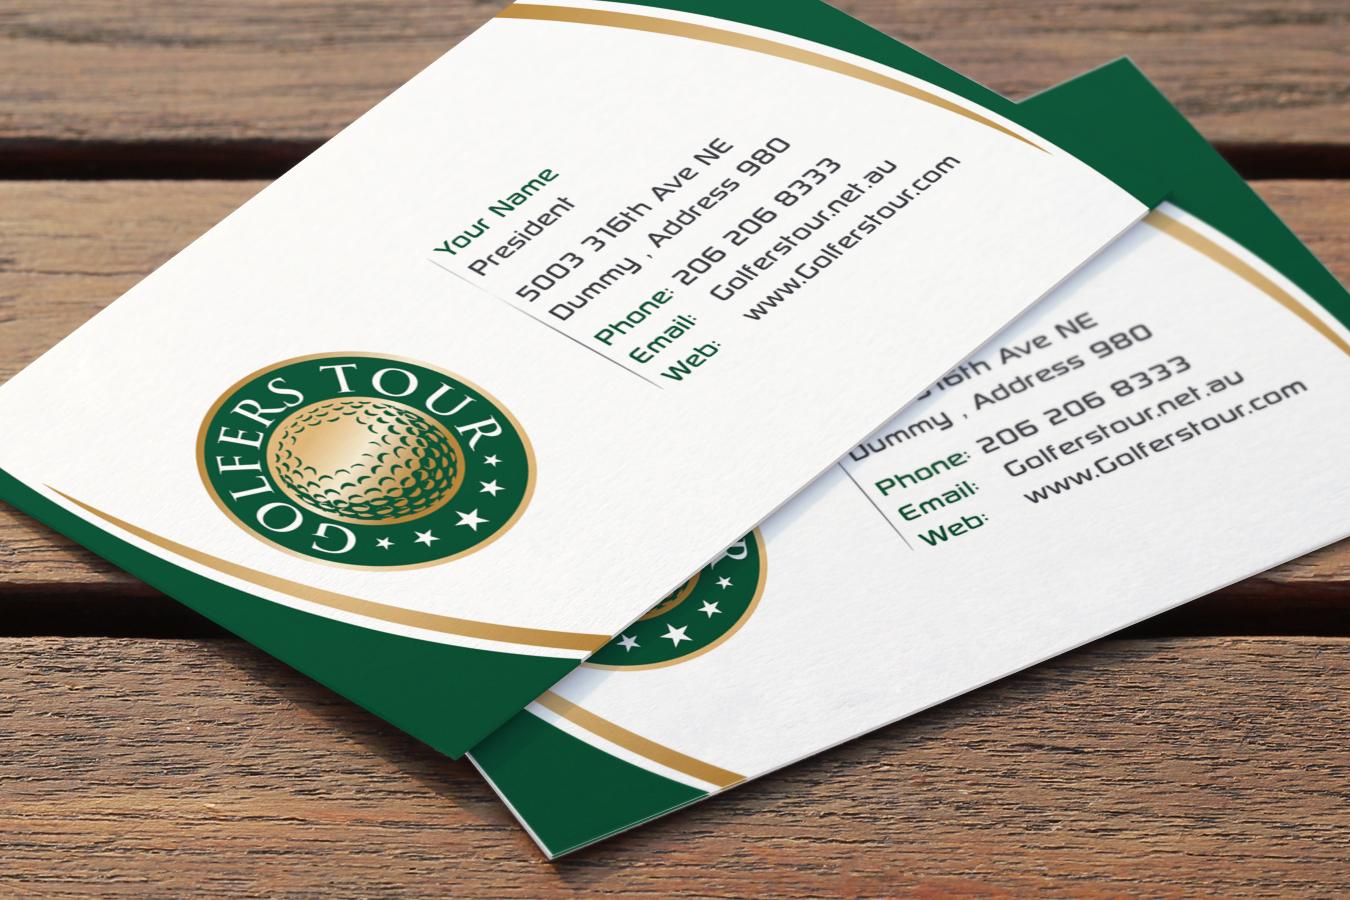 Business dise o de tarjeta de presentaci n for a company - Disenos de tarjetas ...